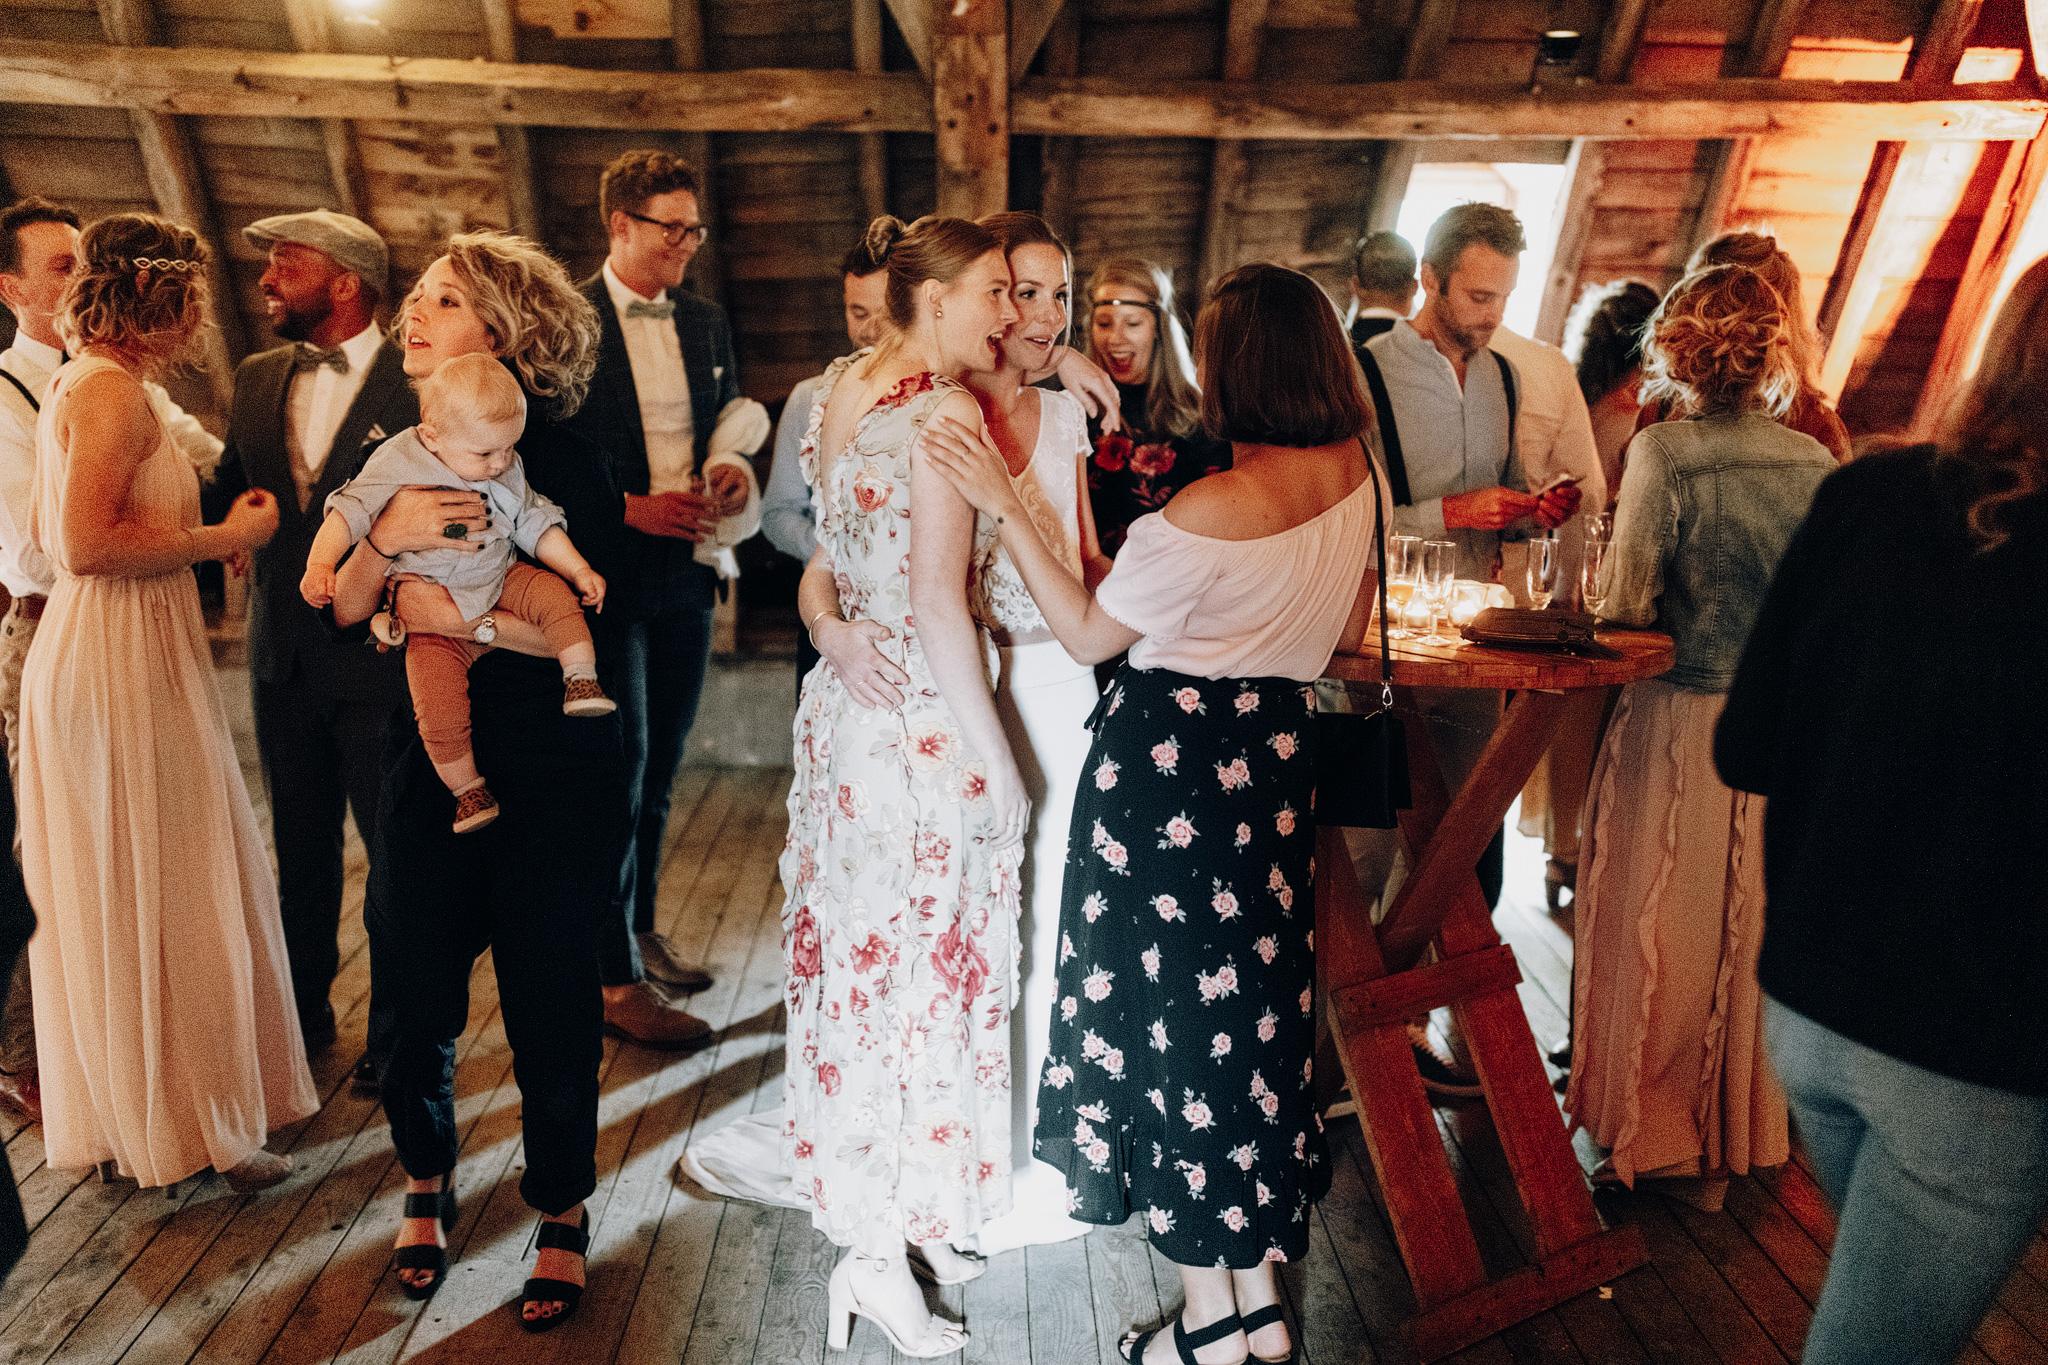 Gasten en bruid op bruiloft Kloster Graefenthal